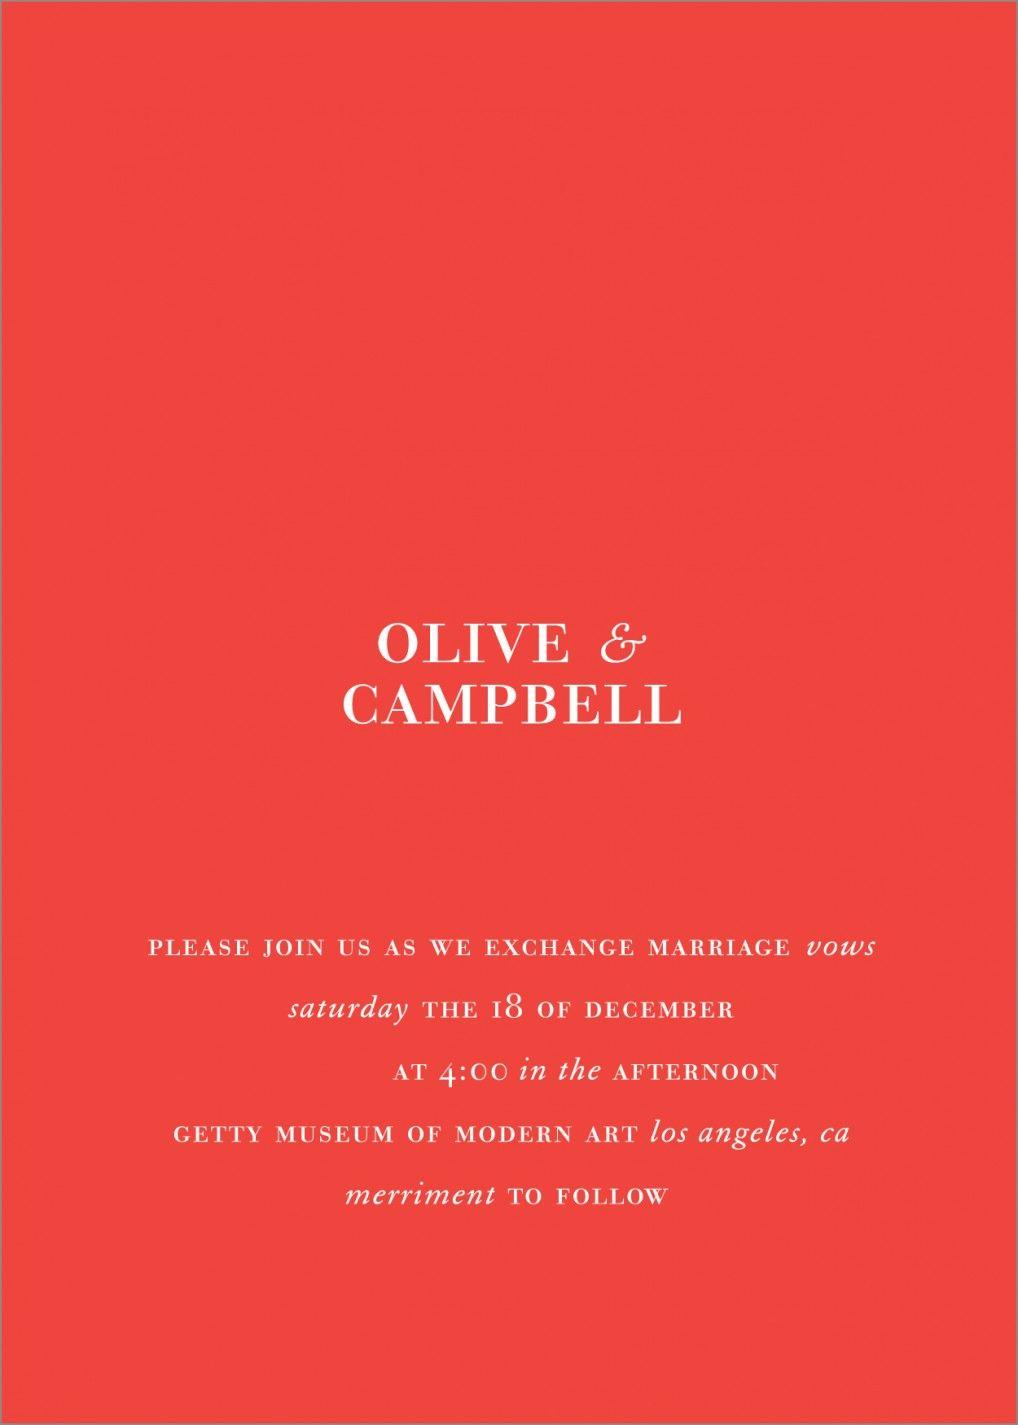 Metropolitan Wedding Invitations | parties & weddings | Pinterest ...